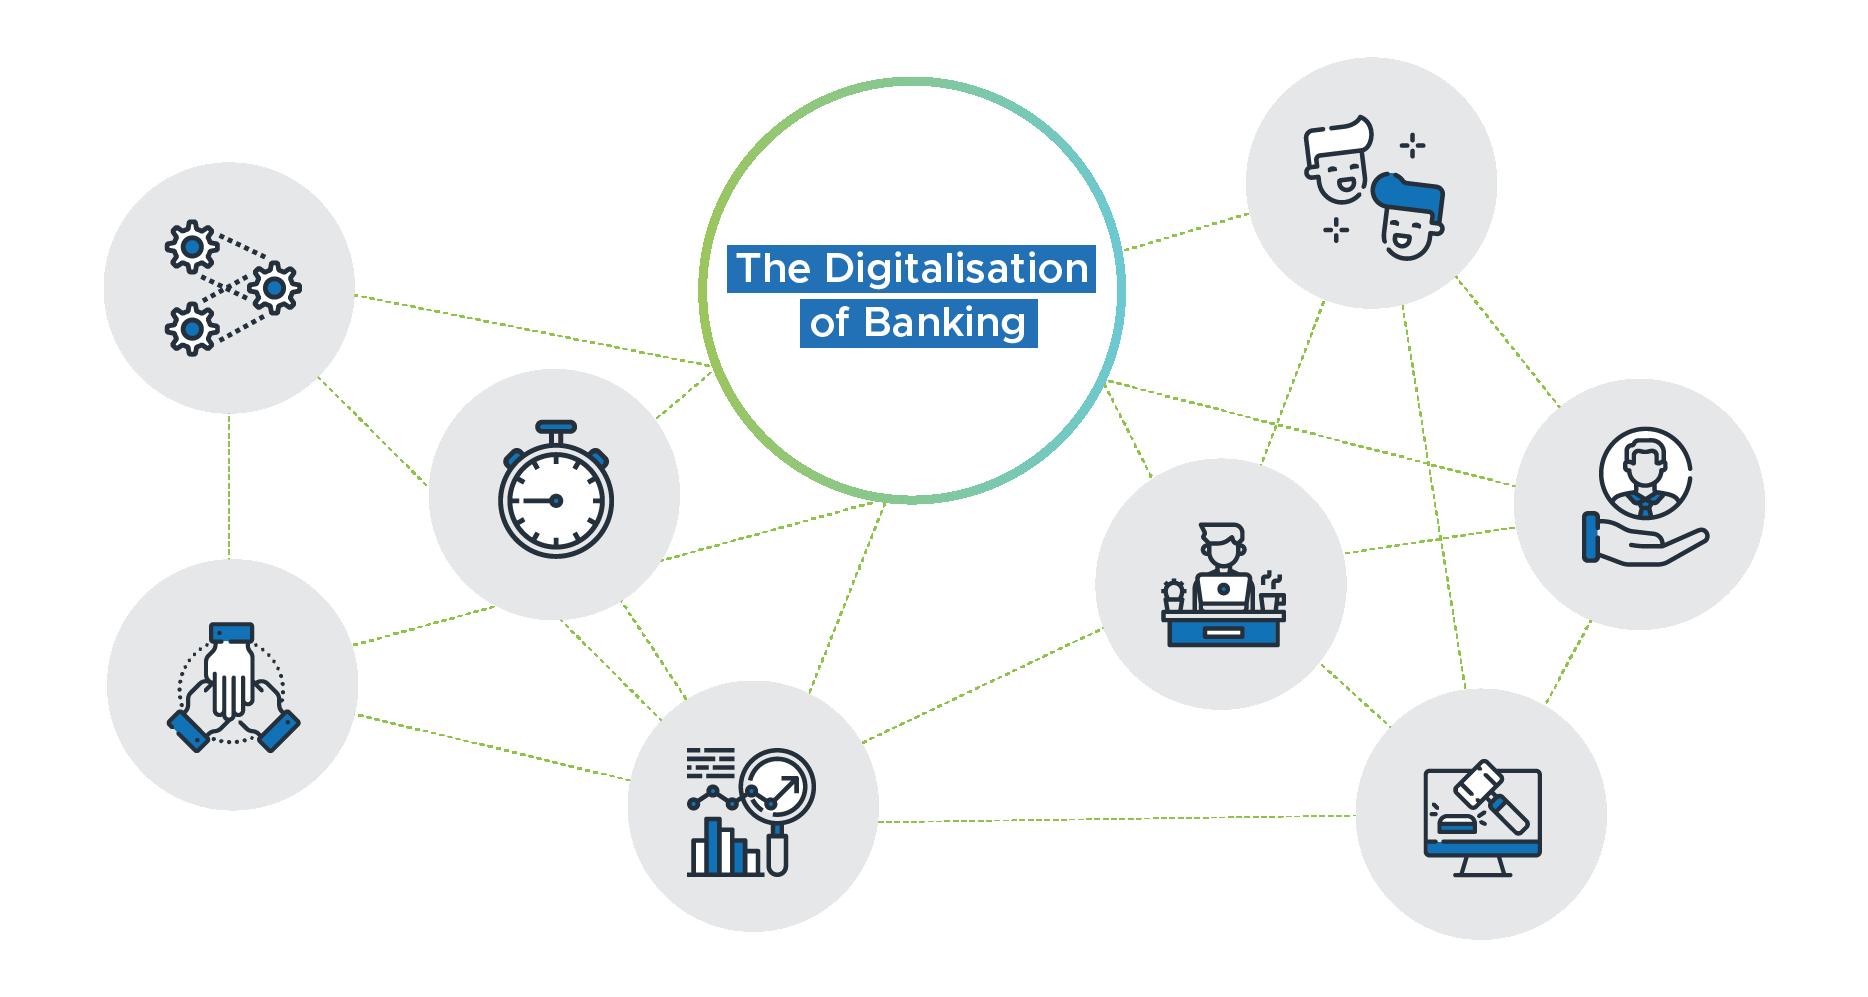 Digitalisation of Banking